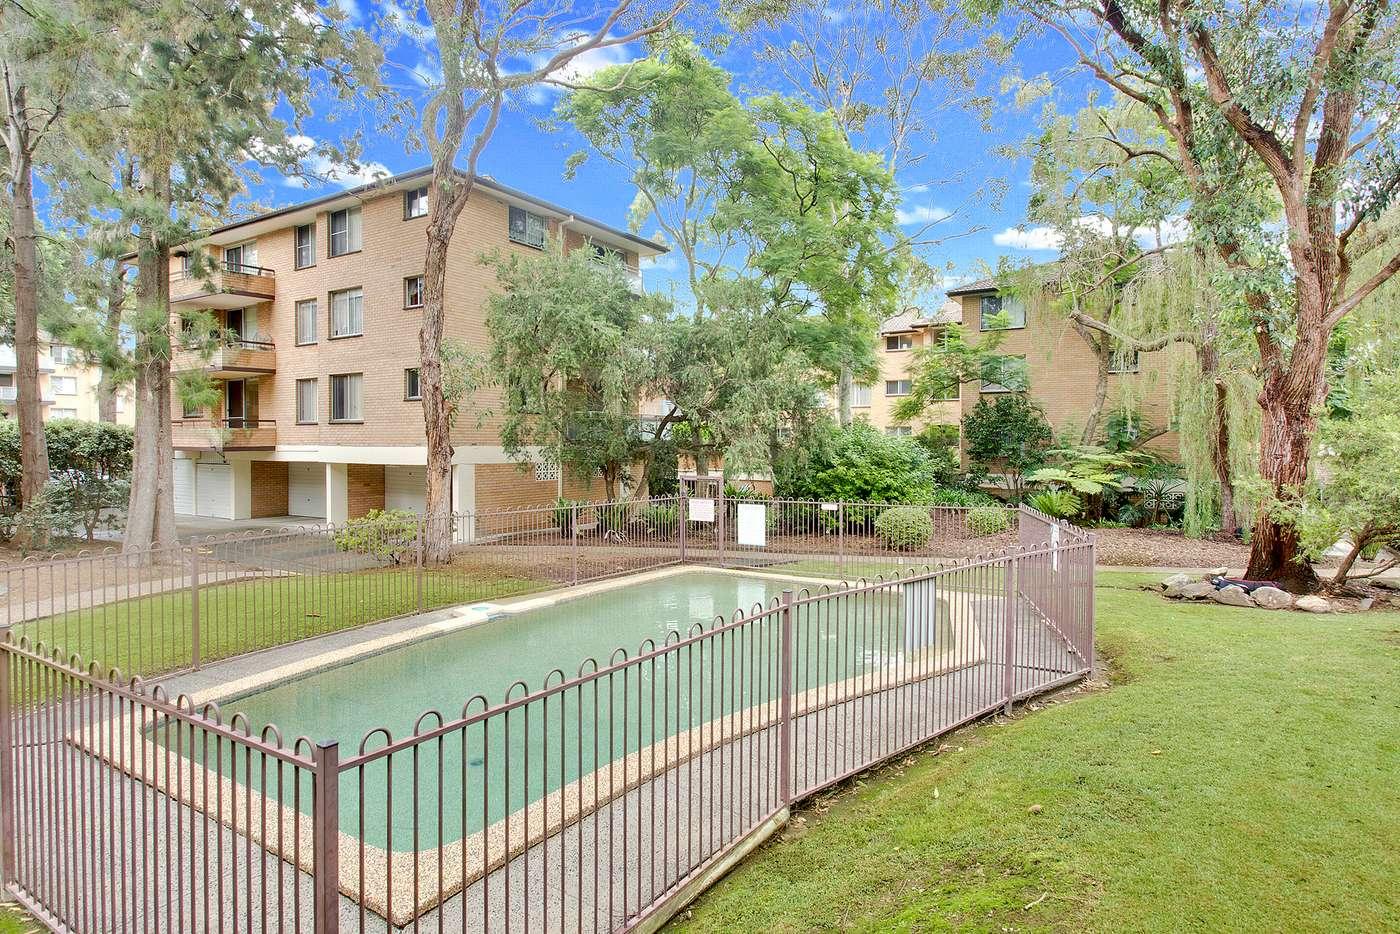 Main view of Homely unit listing, 83/1C Kooringa Road, Chatswood NSW 2067